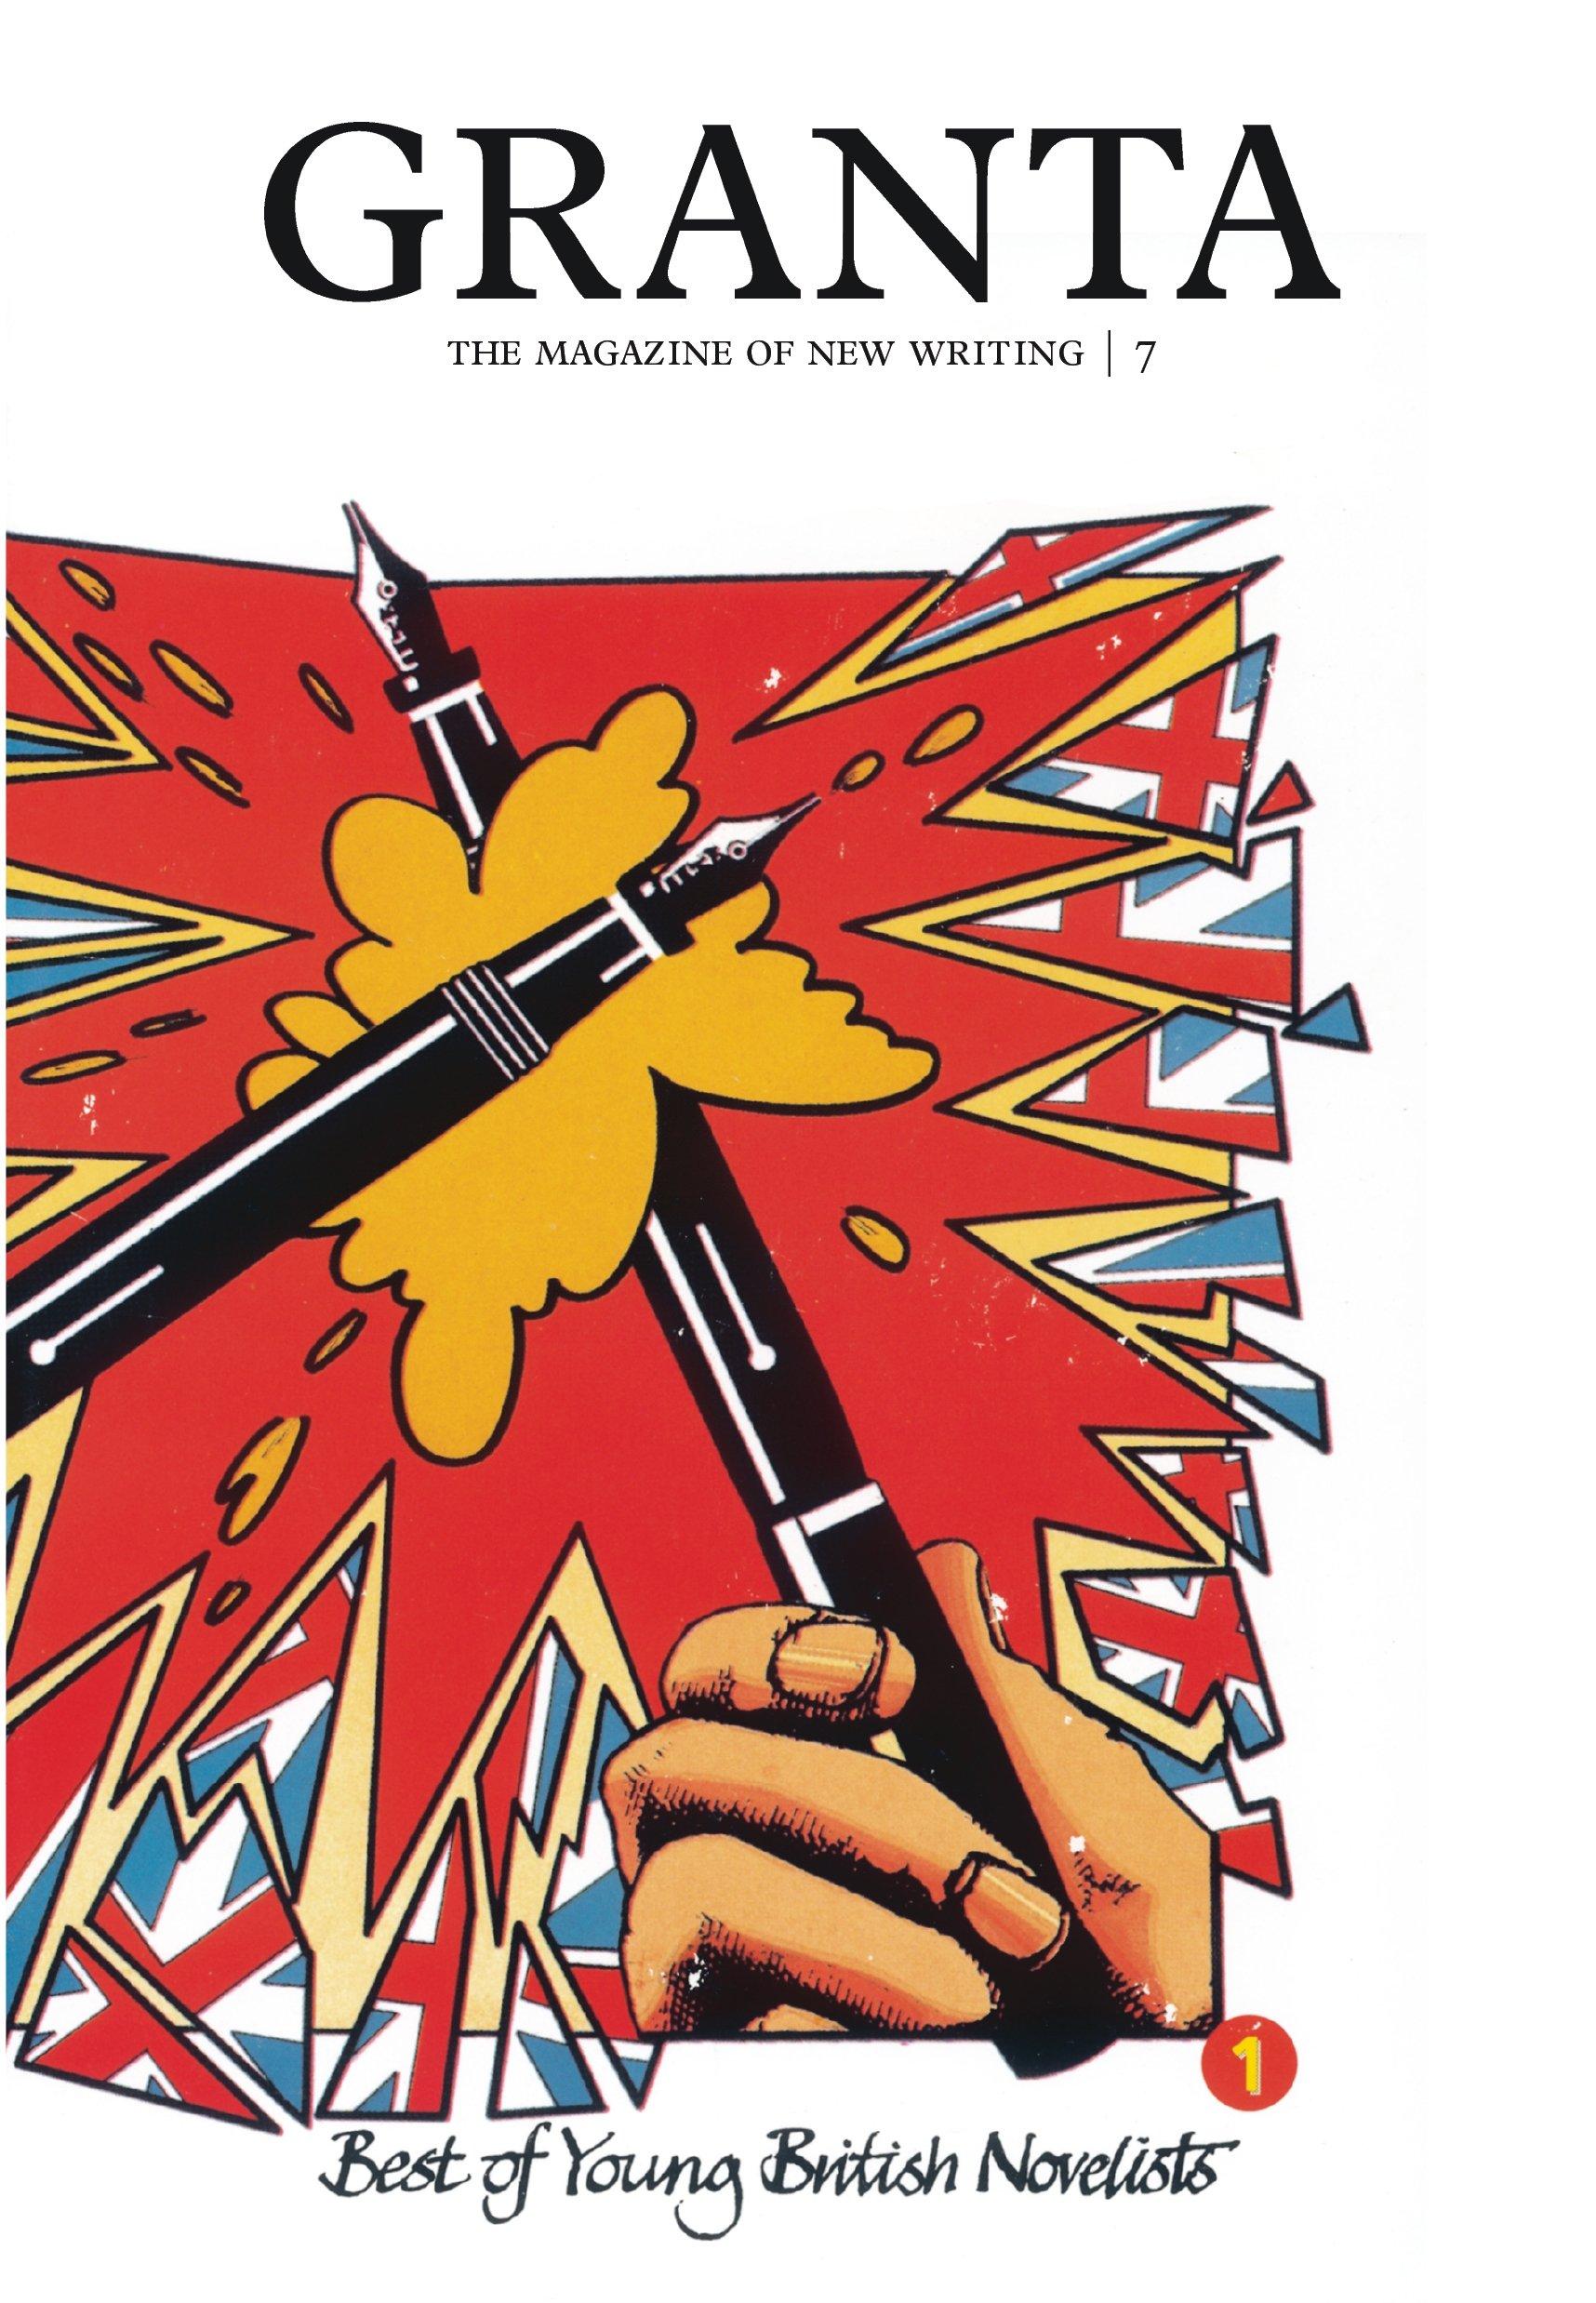 Granta 81: Best Of Young British Novelists 3 (Granta: The Magazine of New Writing)